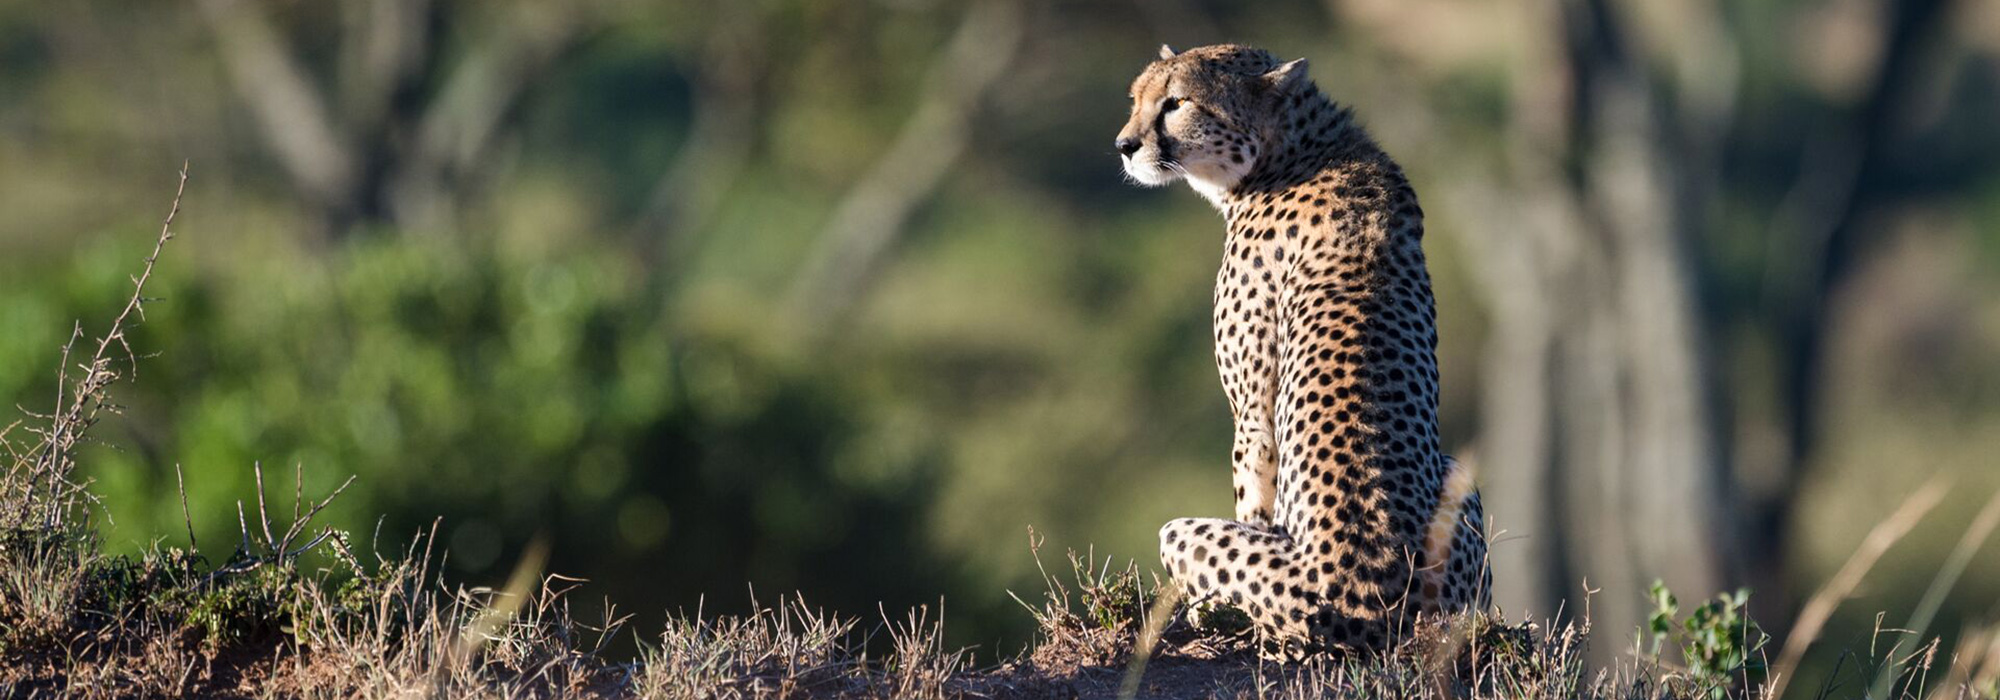 Majestic Leopard